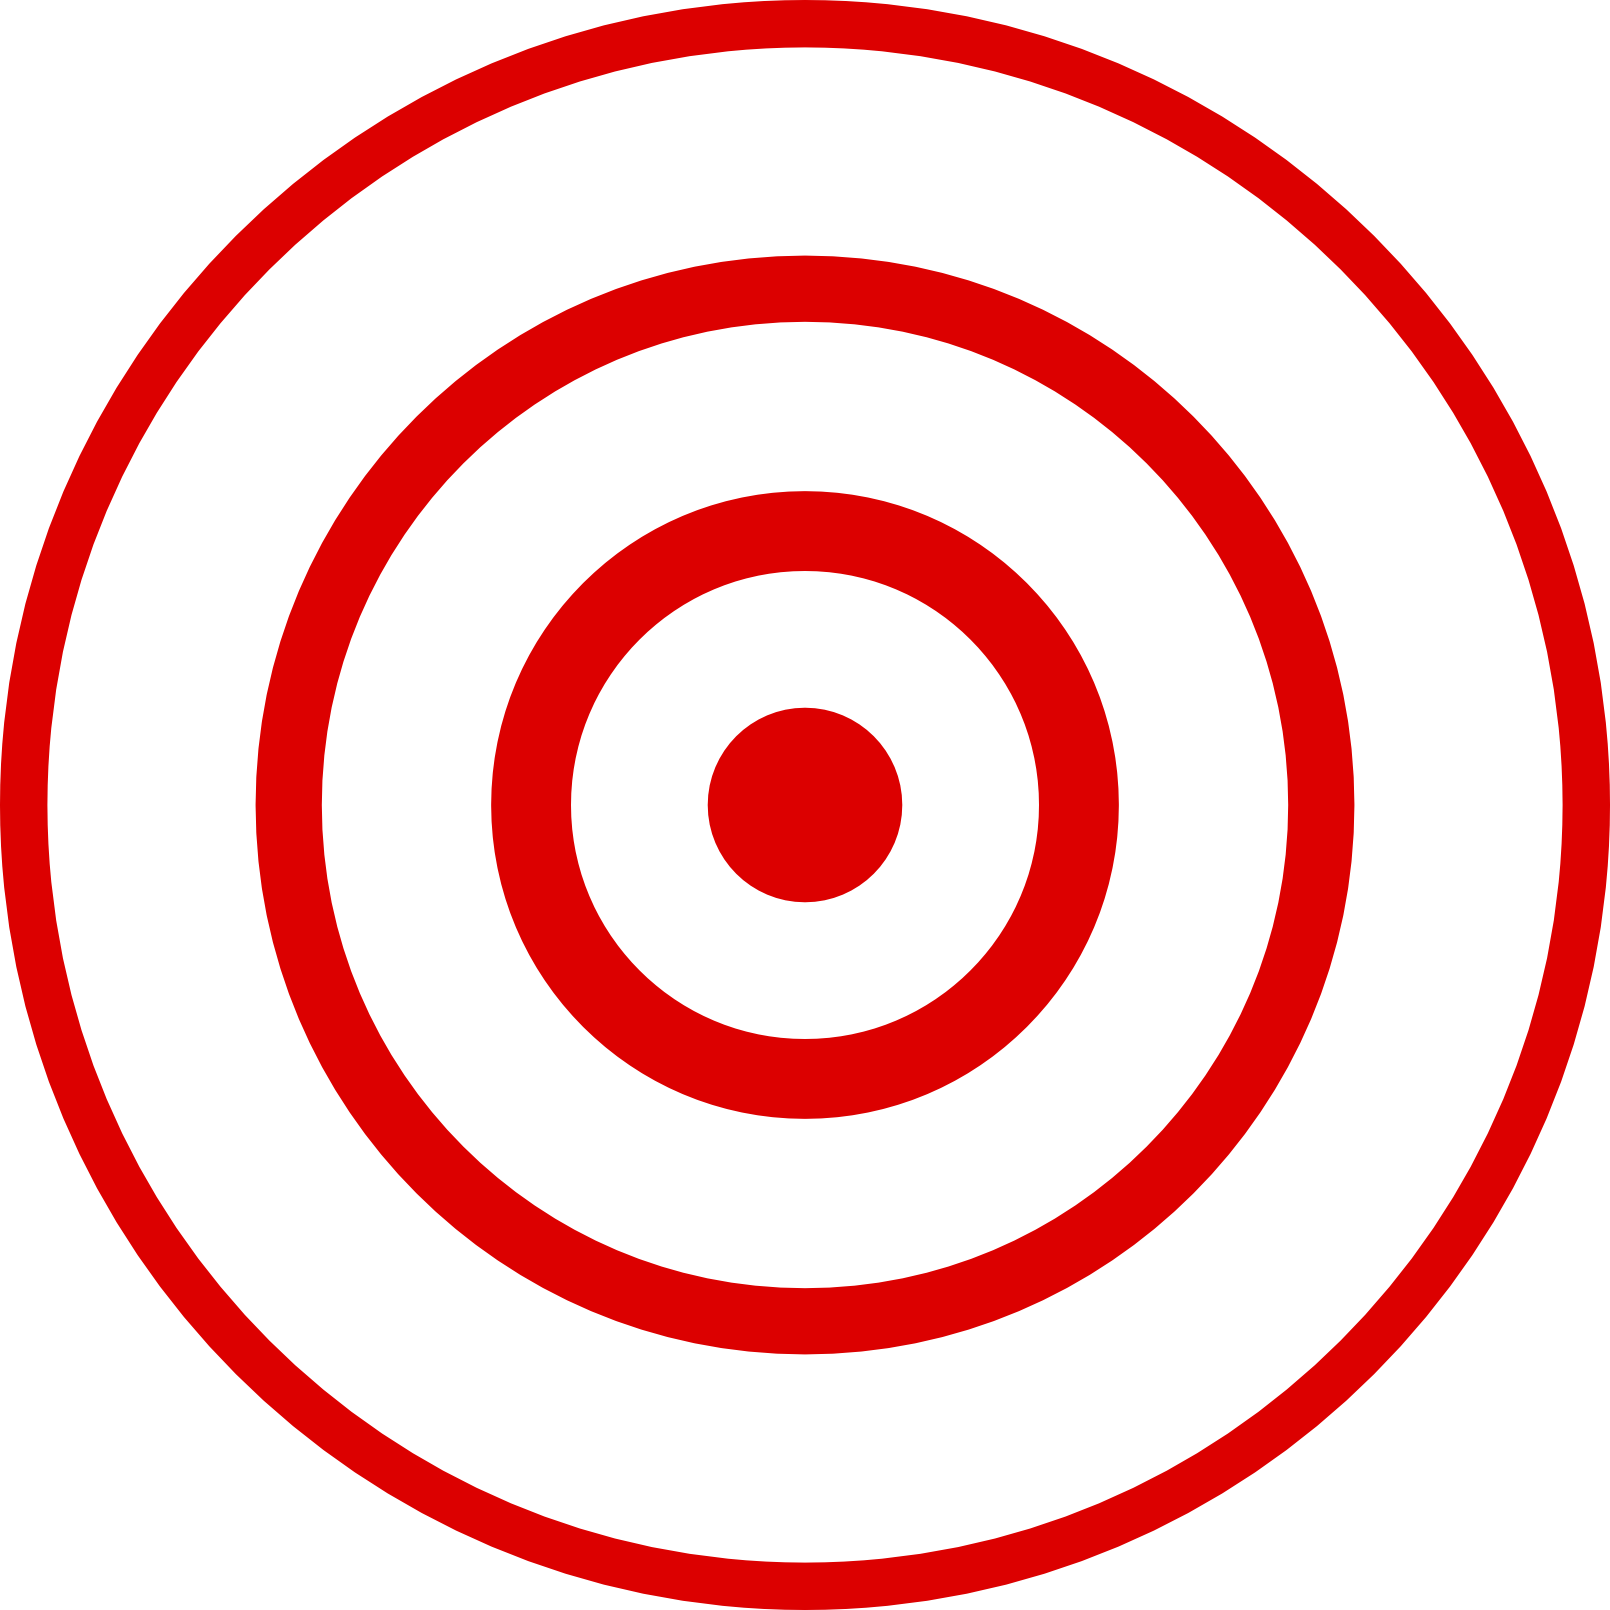 ... Bullseye Clipart - clipartall ...-... Bullseye Clipart - clipartall ...-9